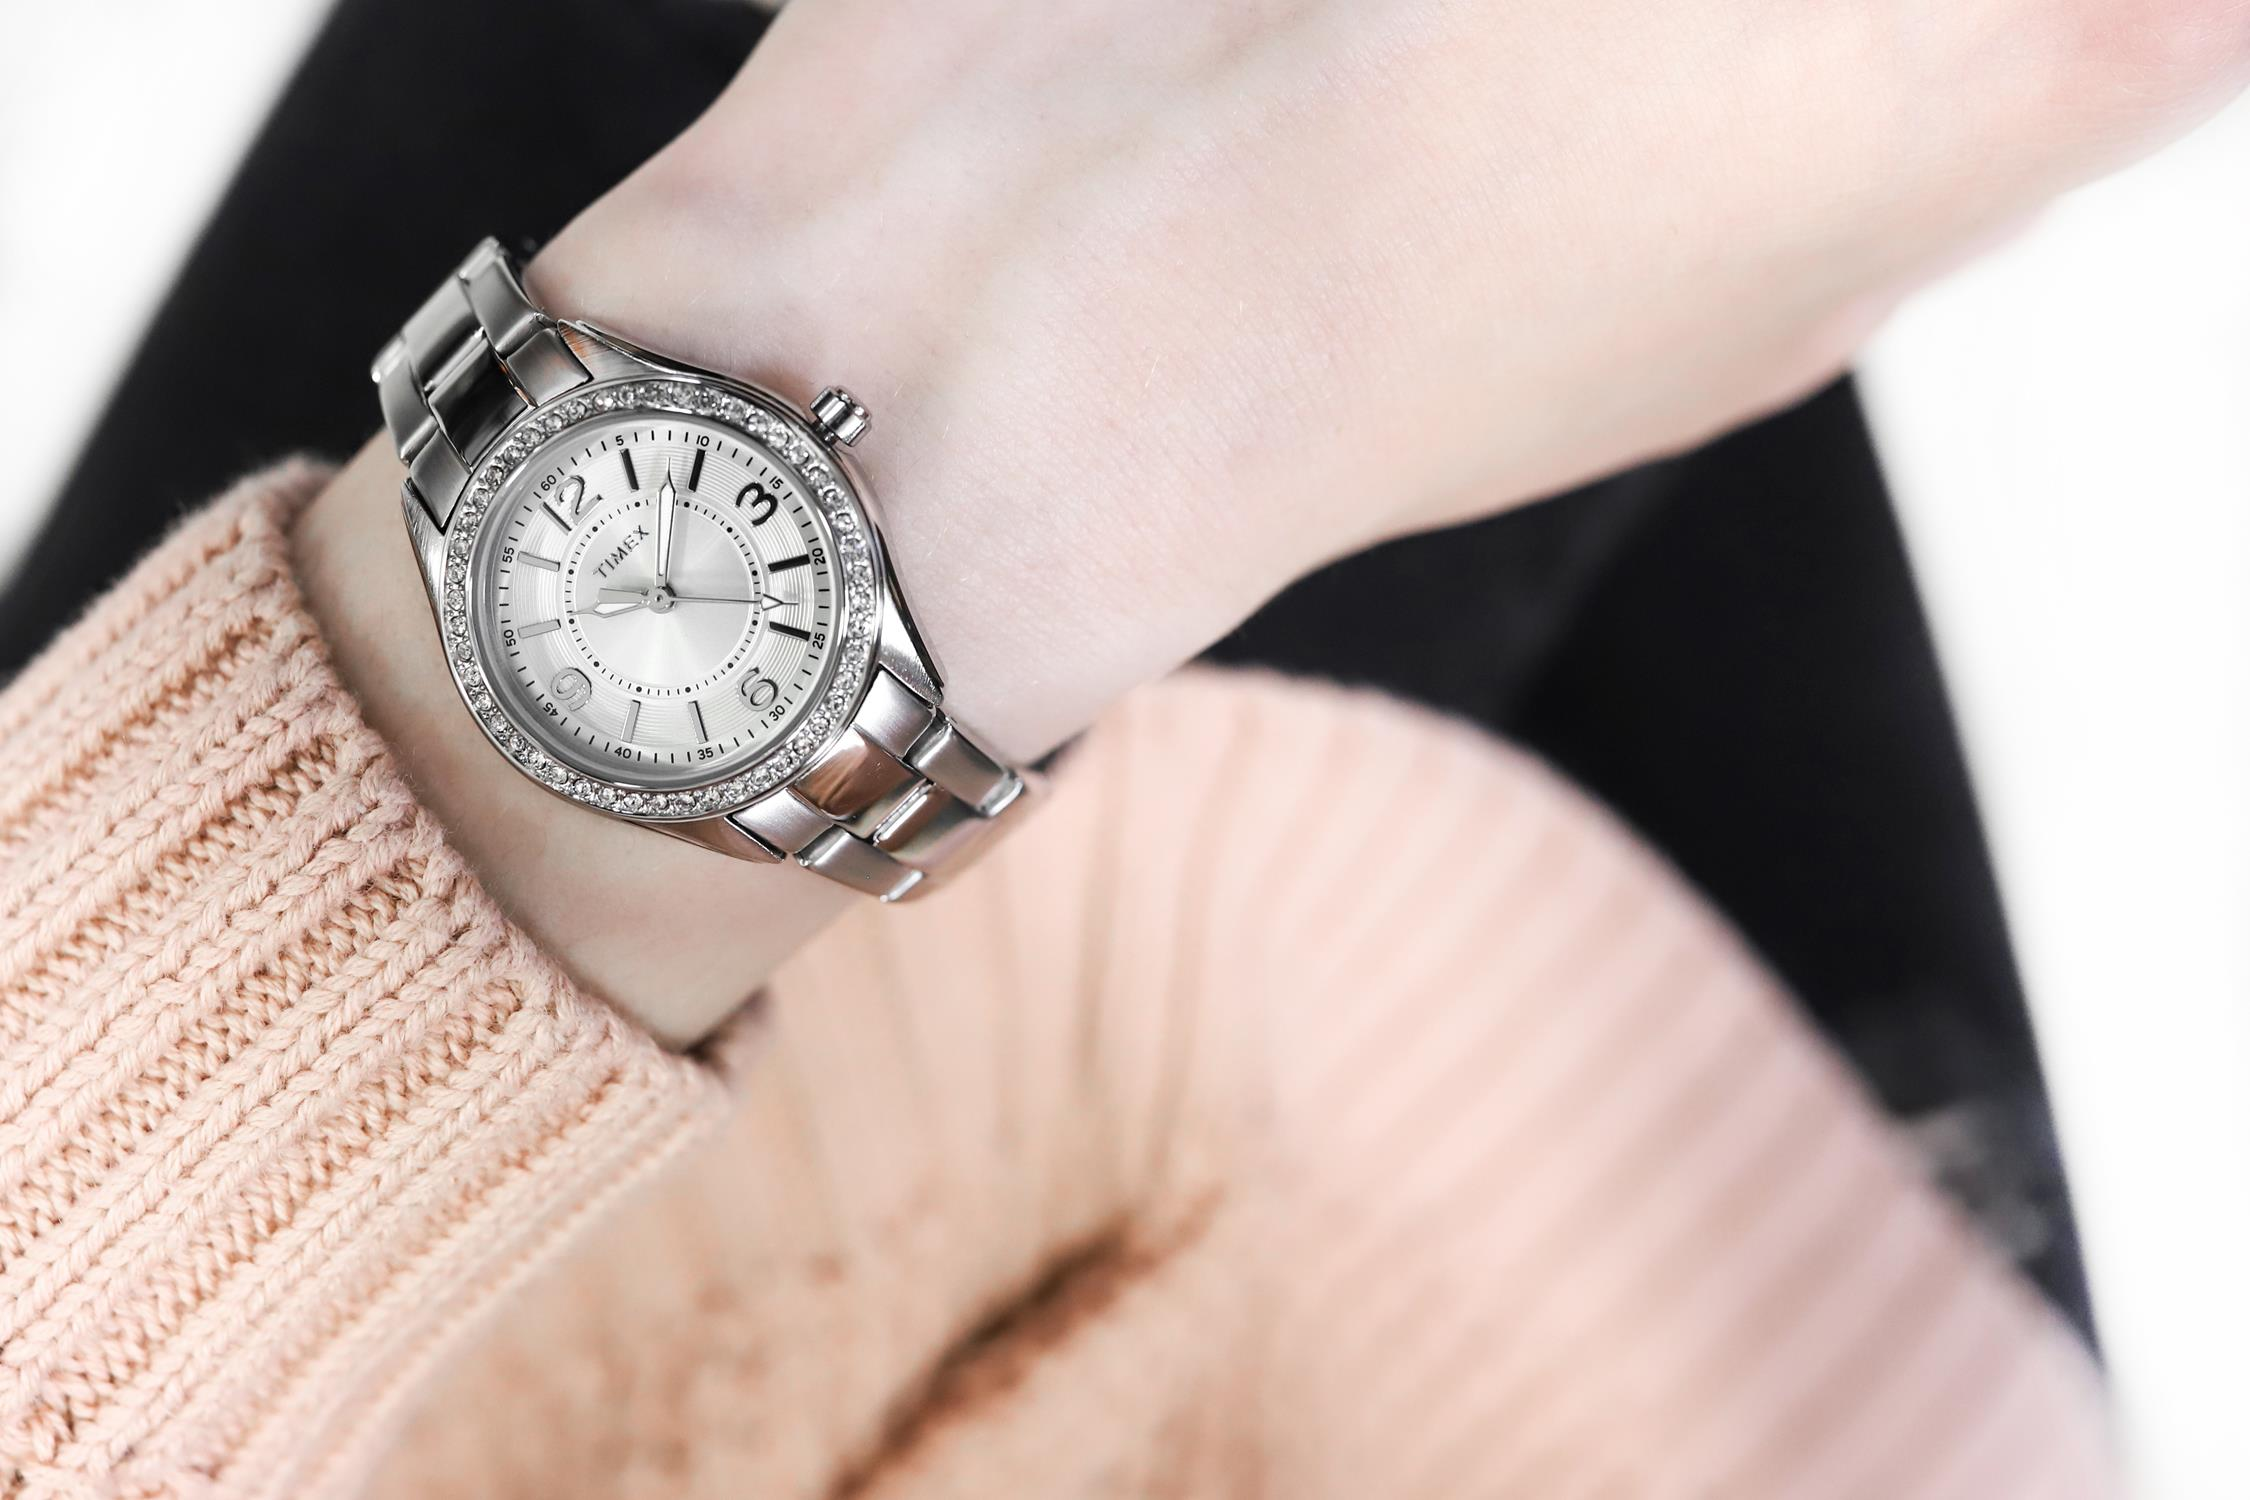 Timex TW2P79800 zegarek srebrny fashion/modowy Fashion bransoleta